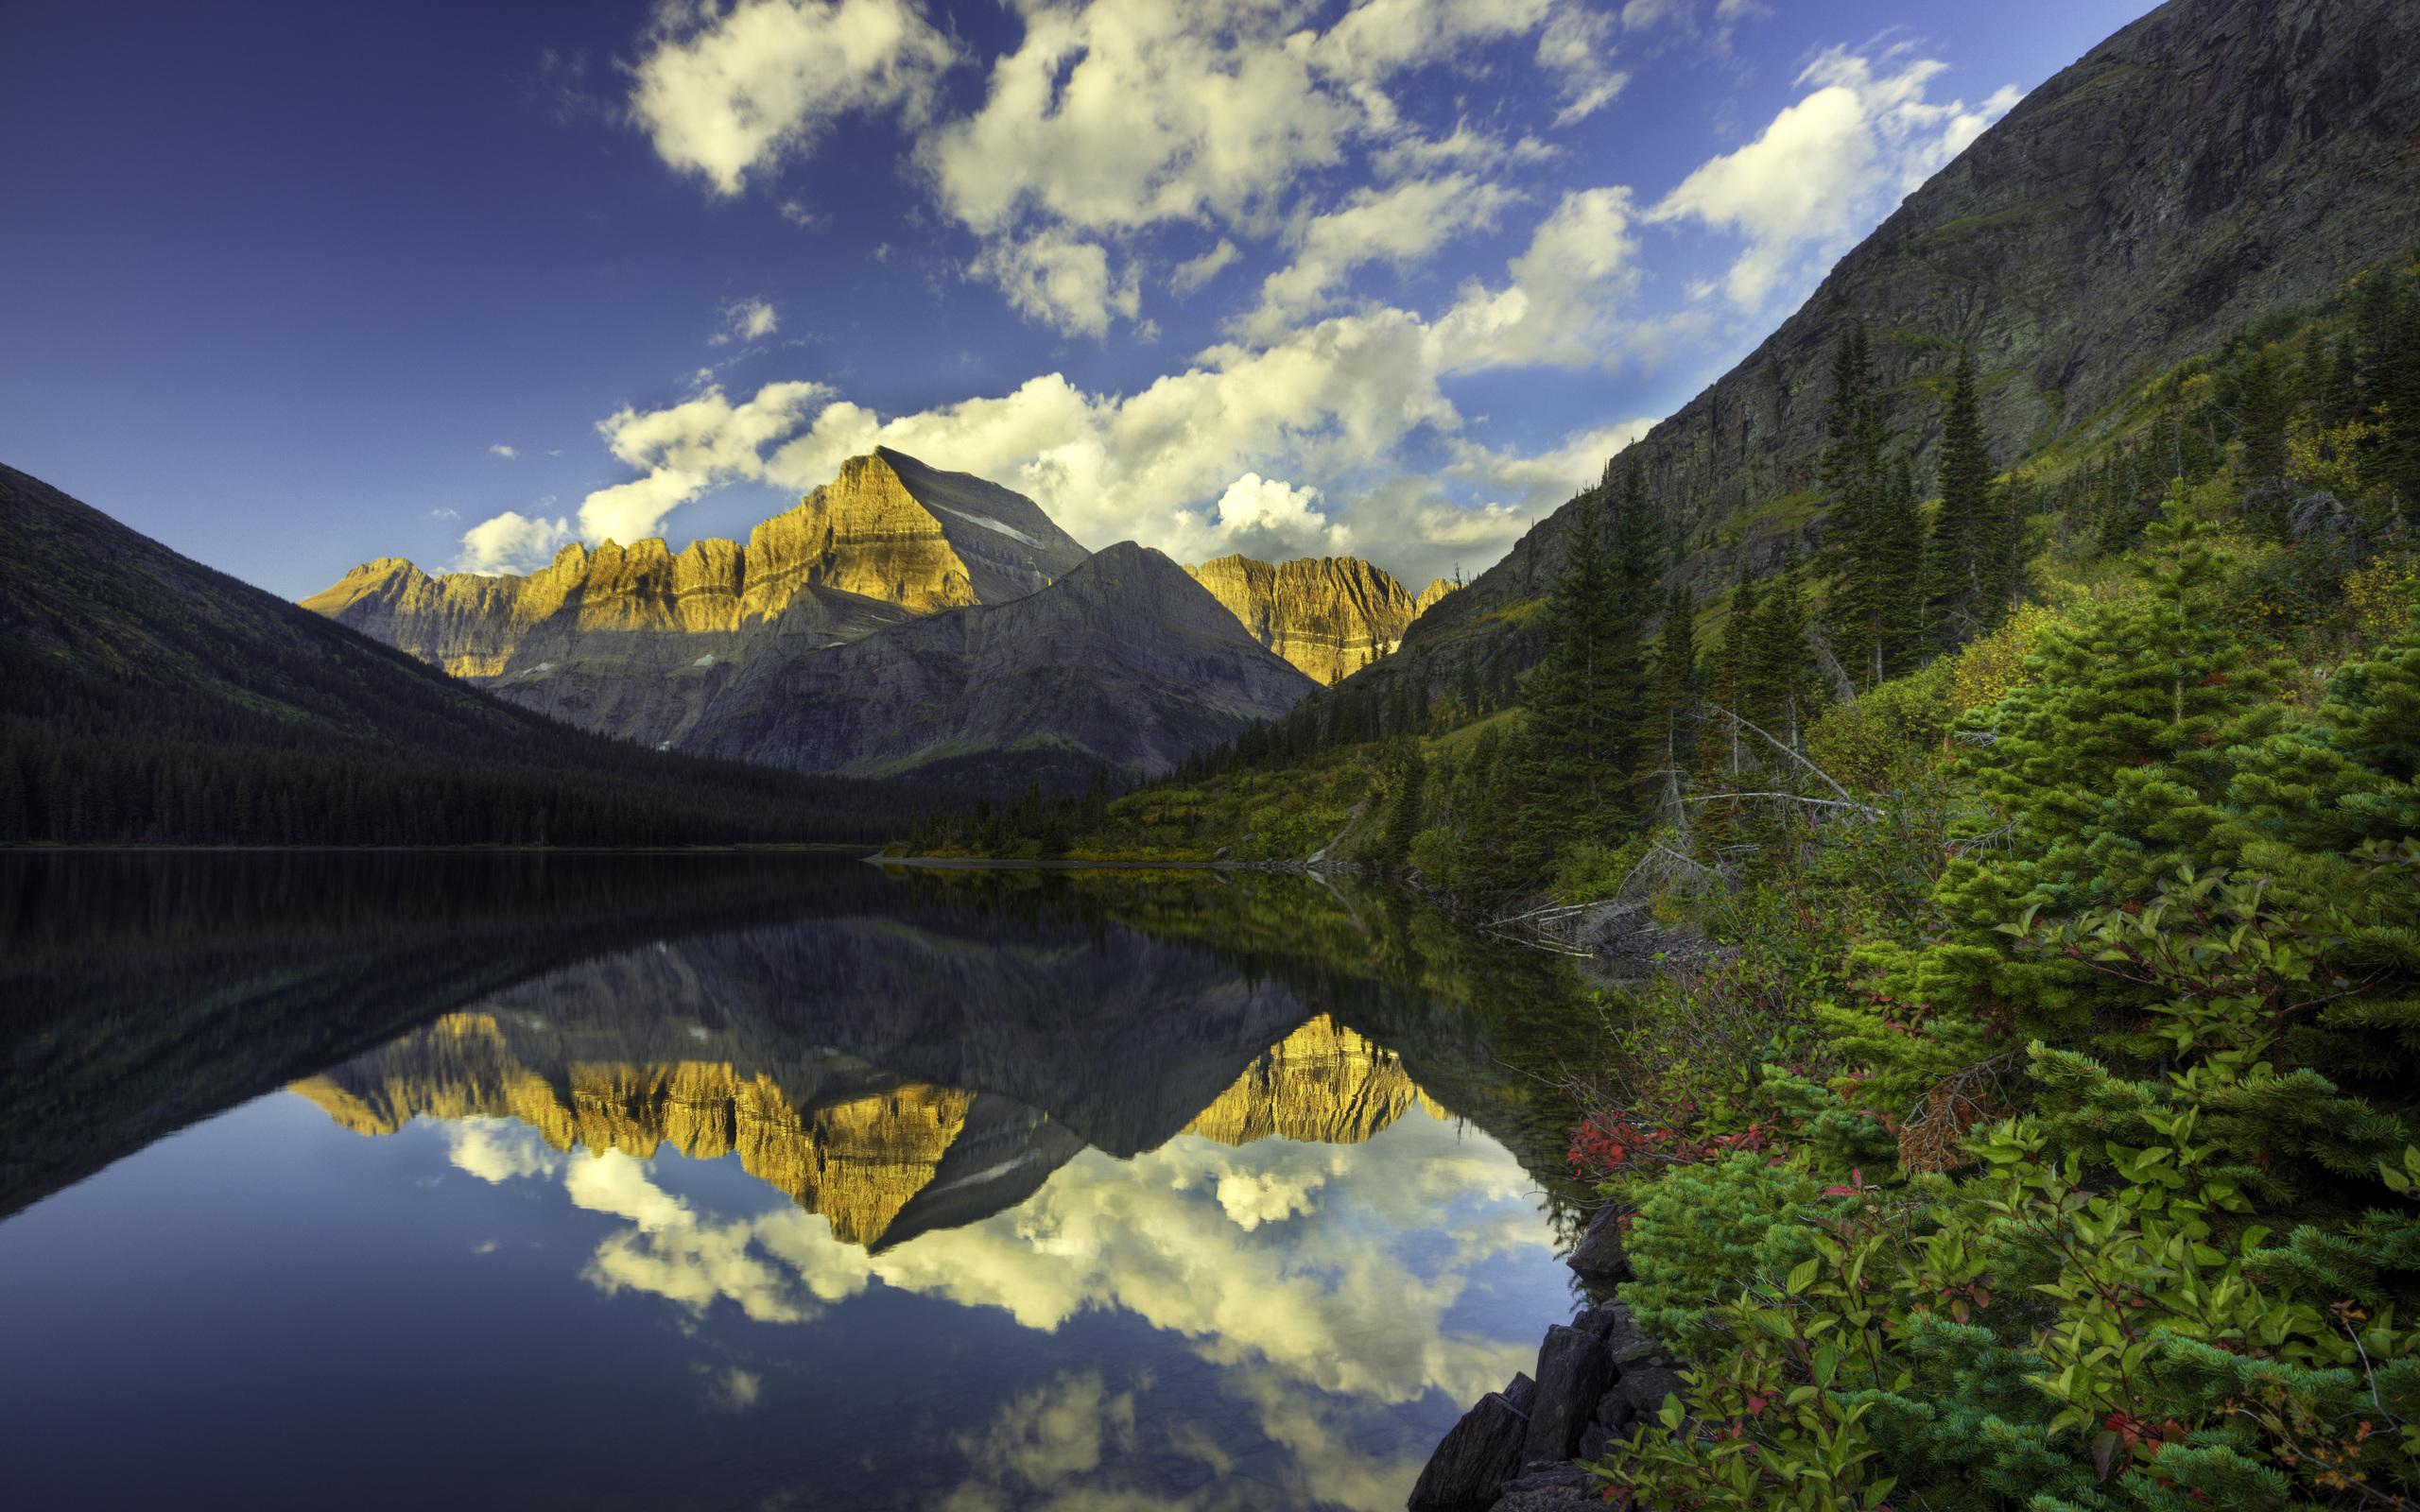 Willow Lake and Mount Wrangell, Wrangell Saint Elias National Park, Alaska загрузить